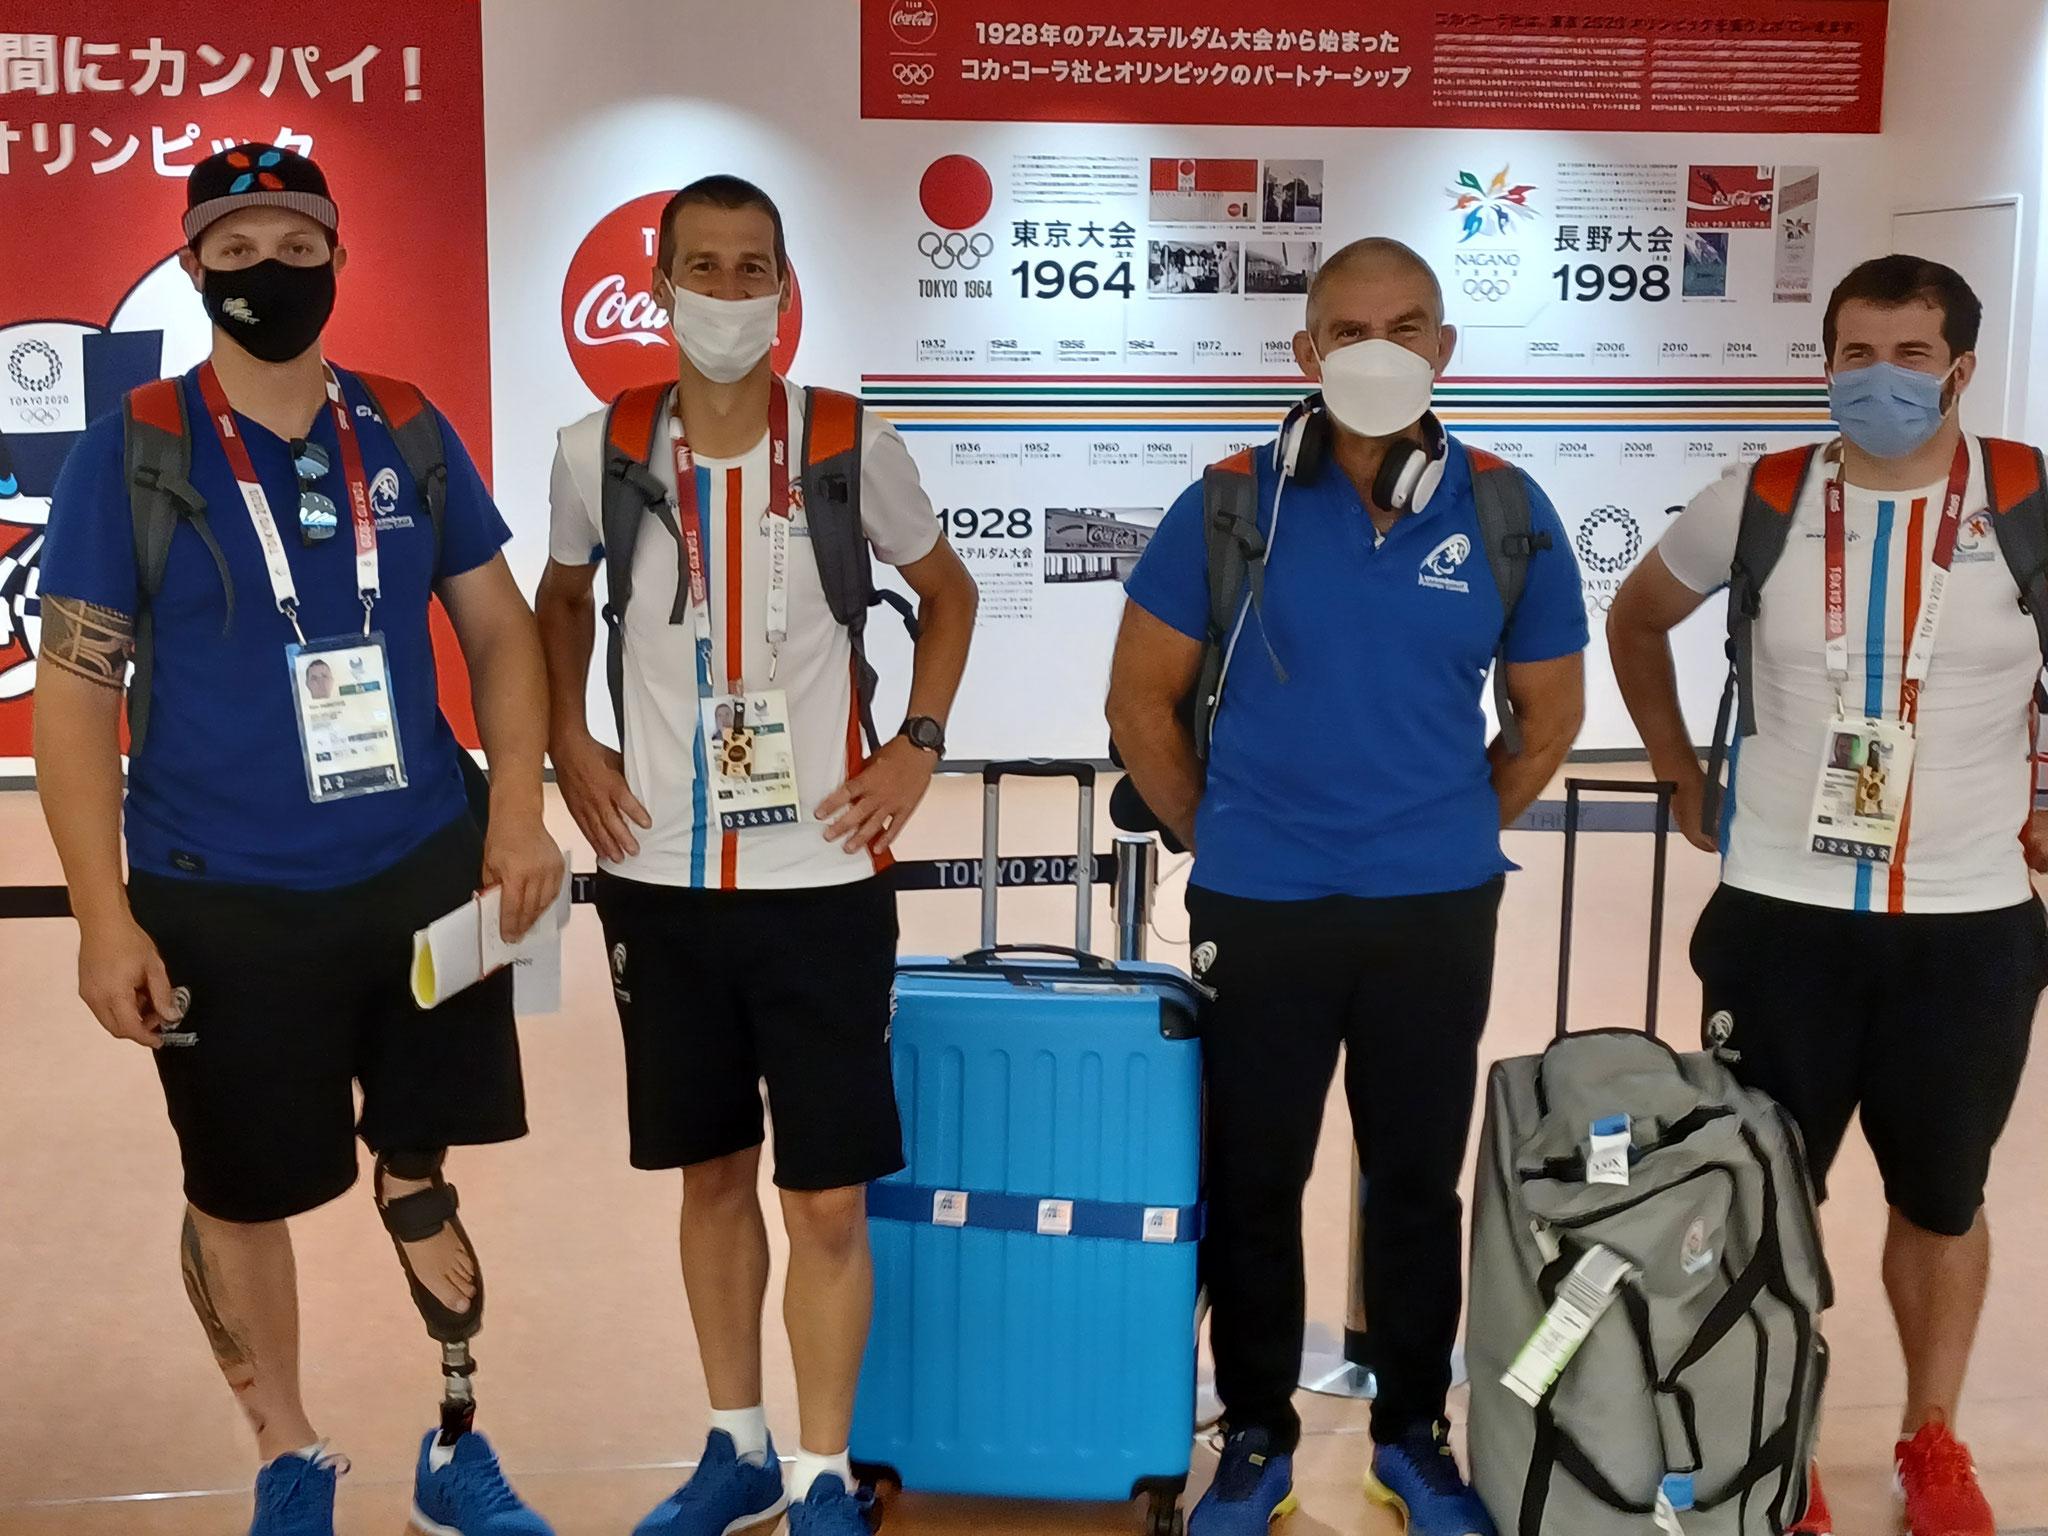 der Ankunft am Flughafen Haneda